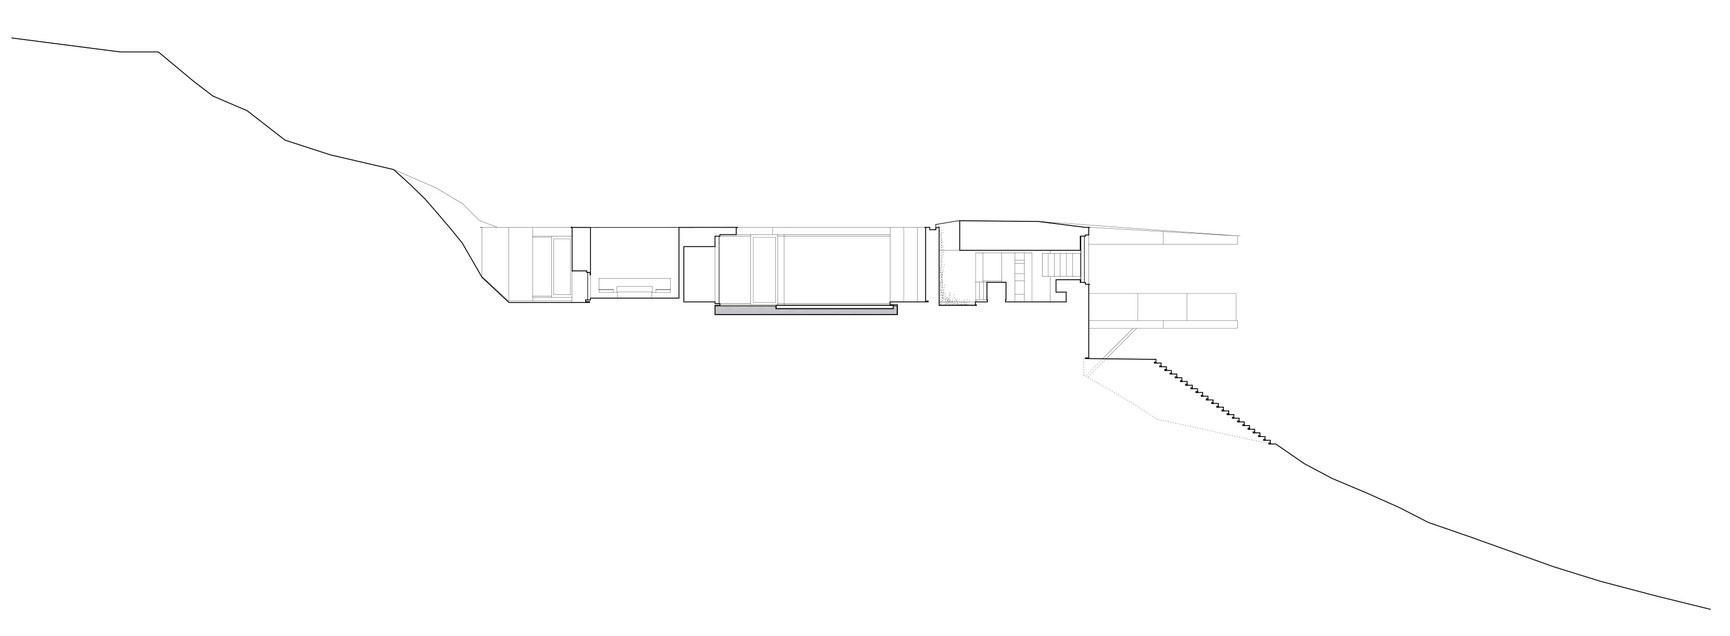 Tula House by Patkau Architects-35